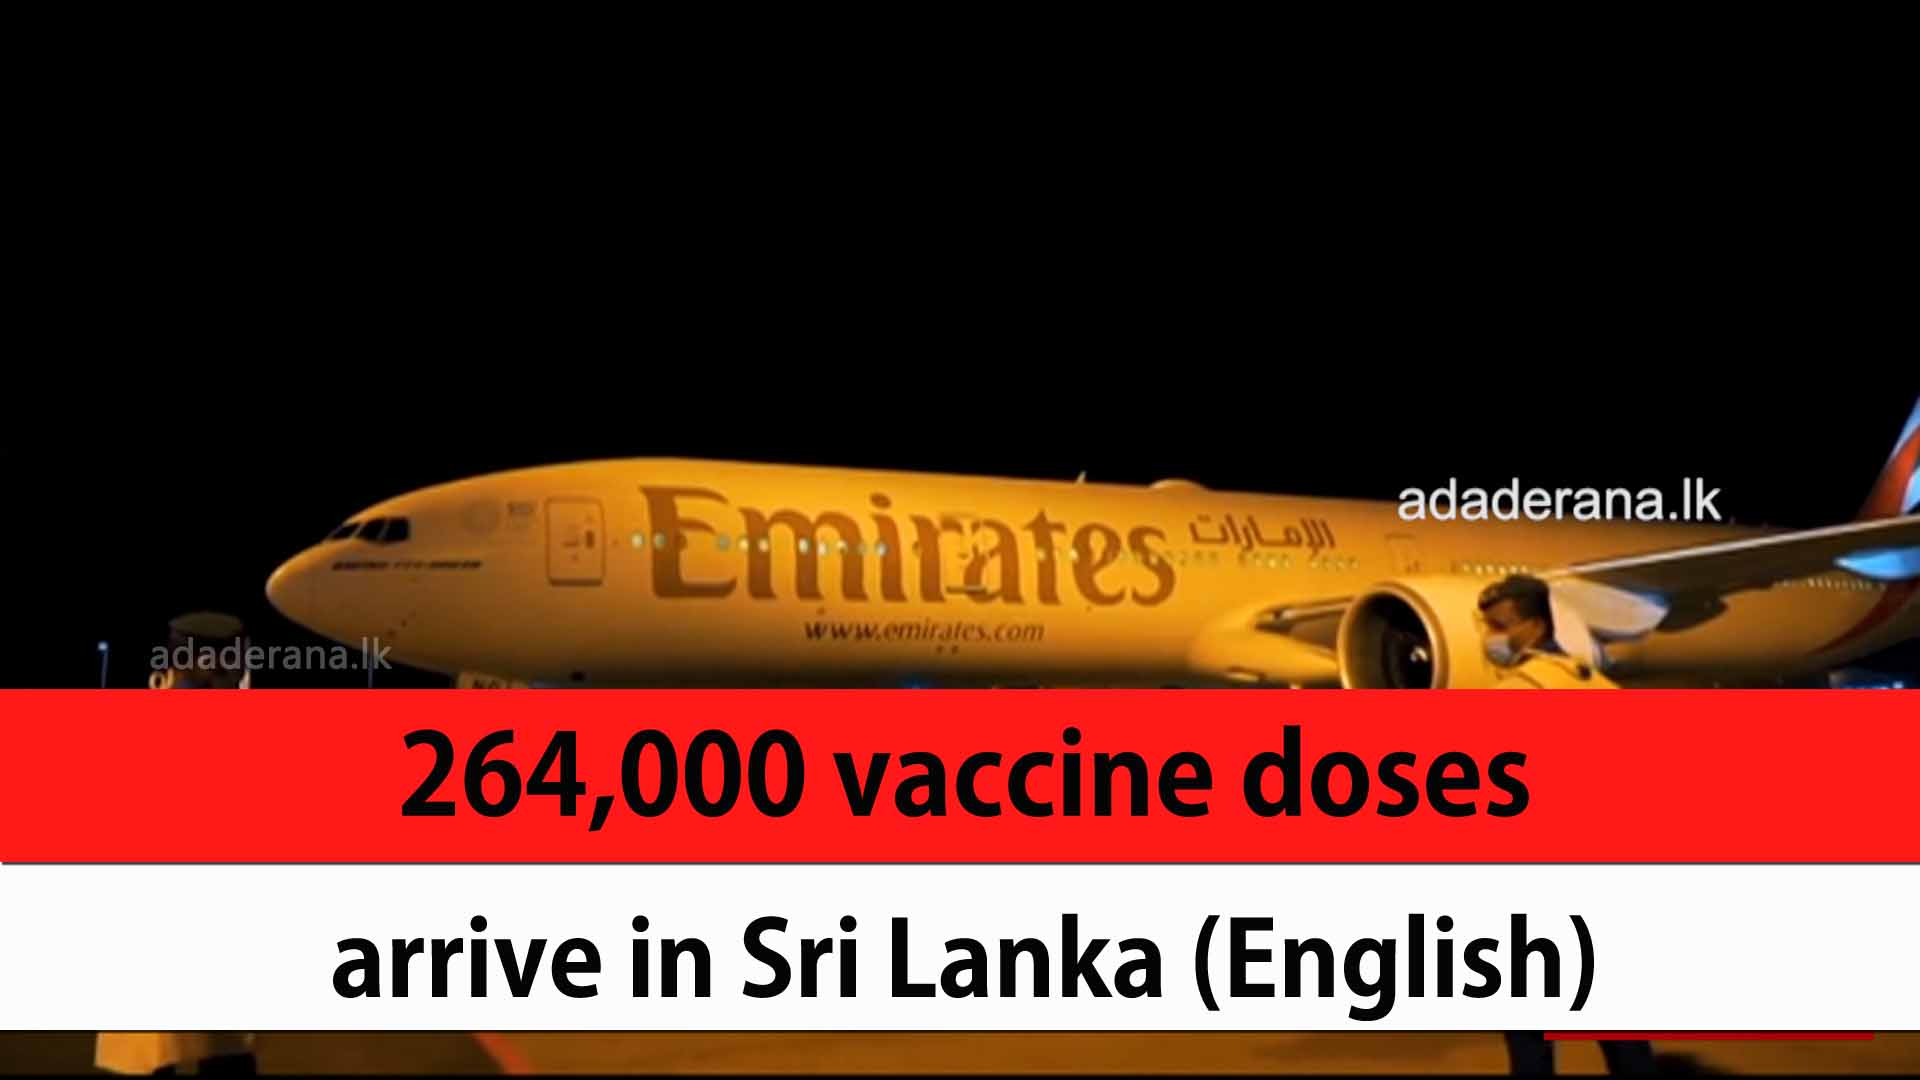 264,000 vaccine doses arrive in Sri Lanka (English)